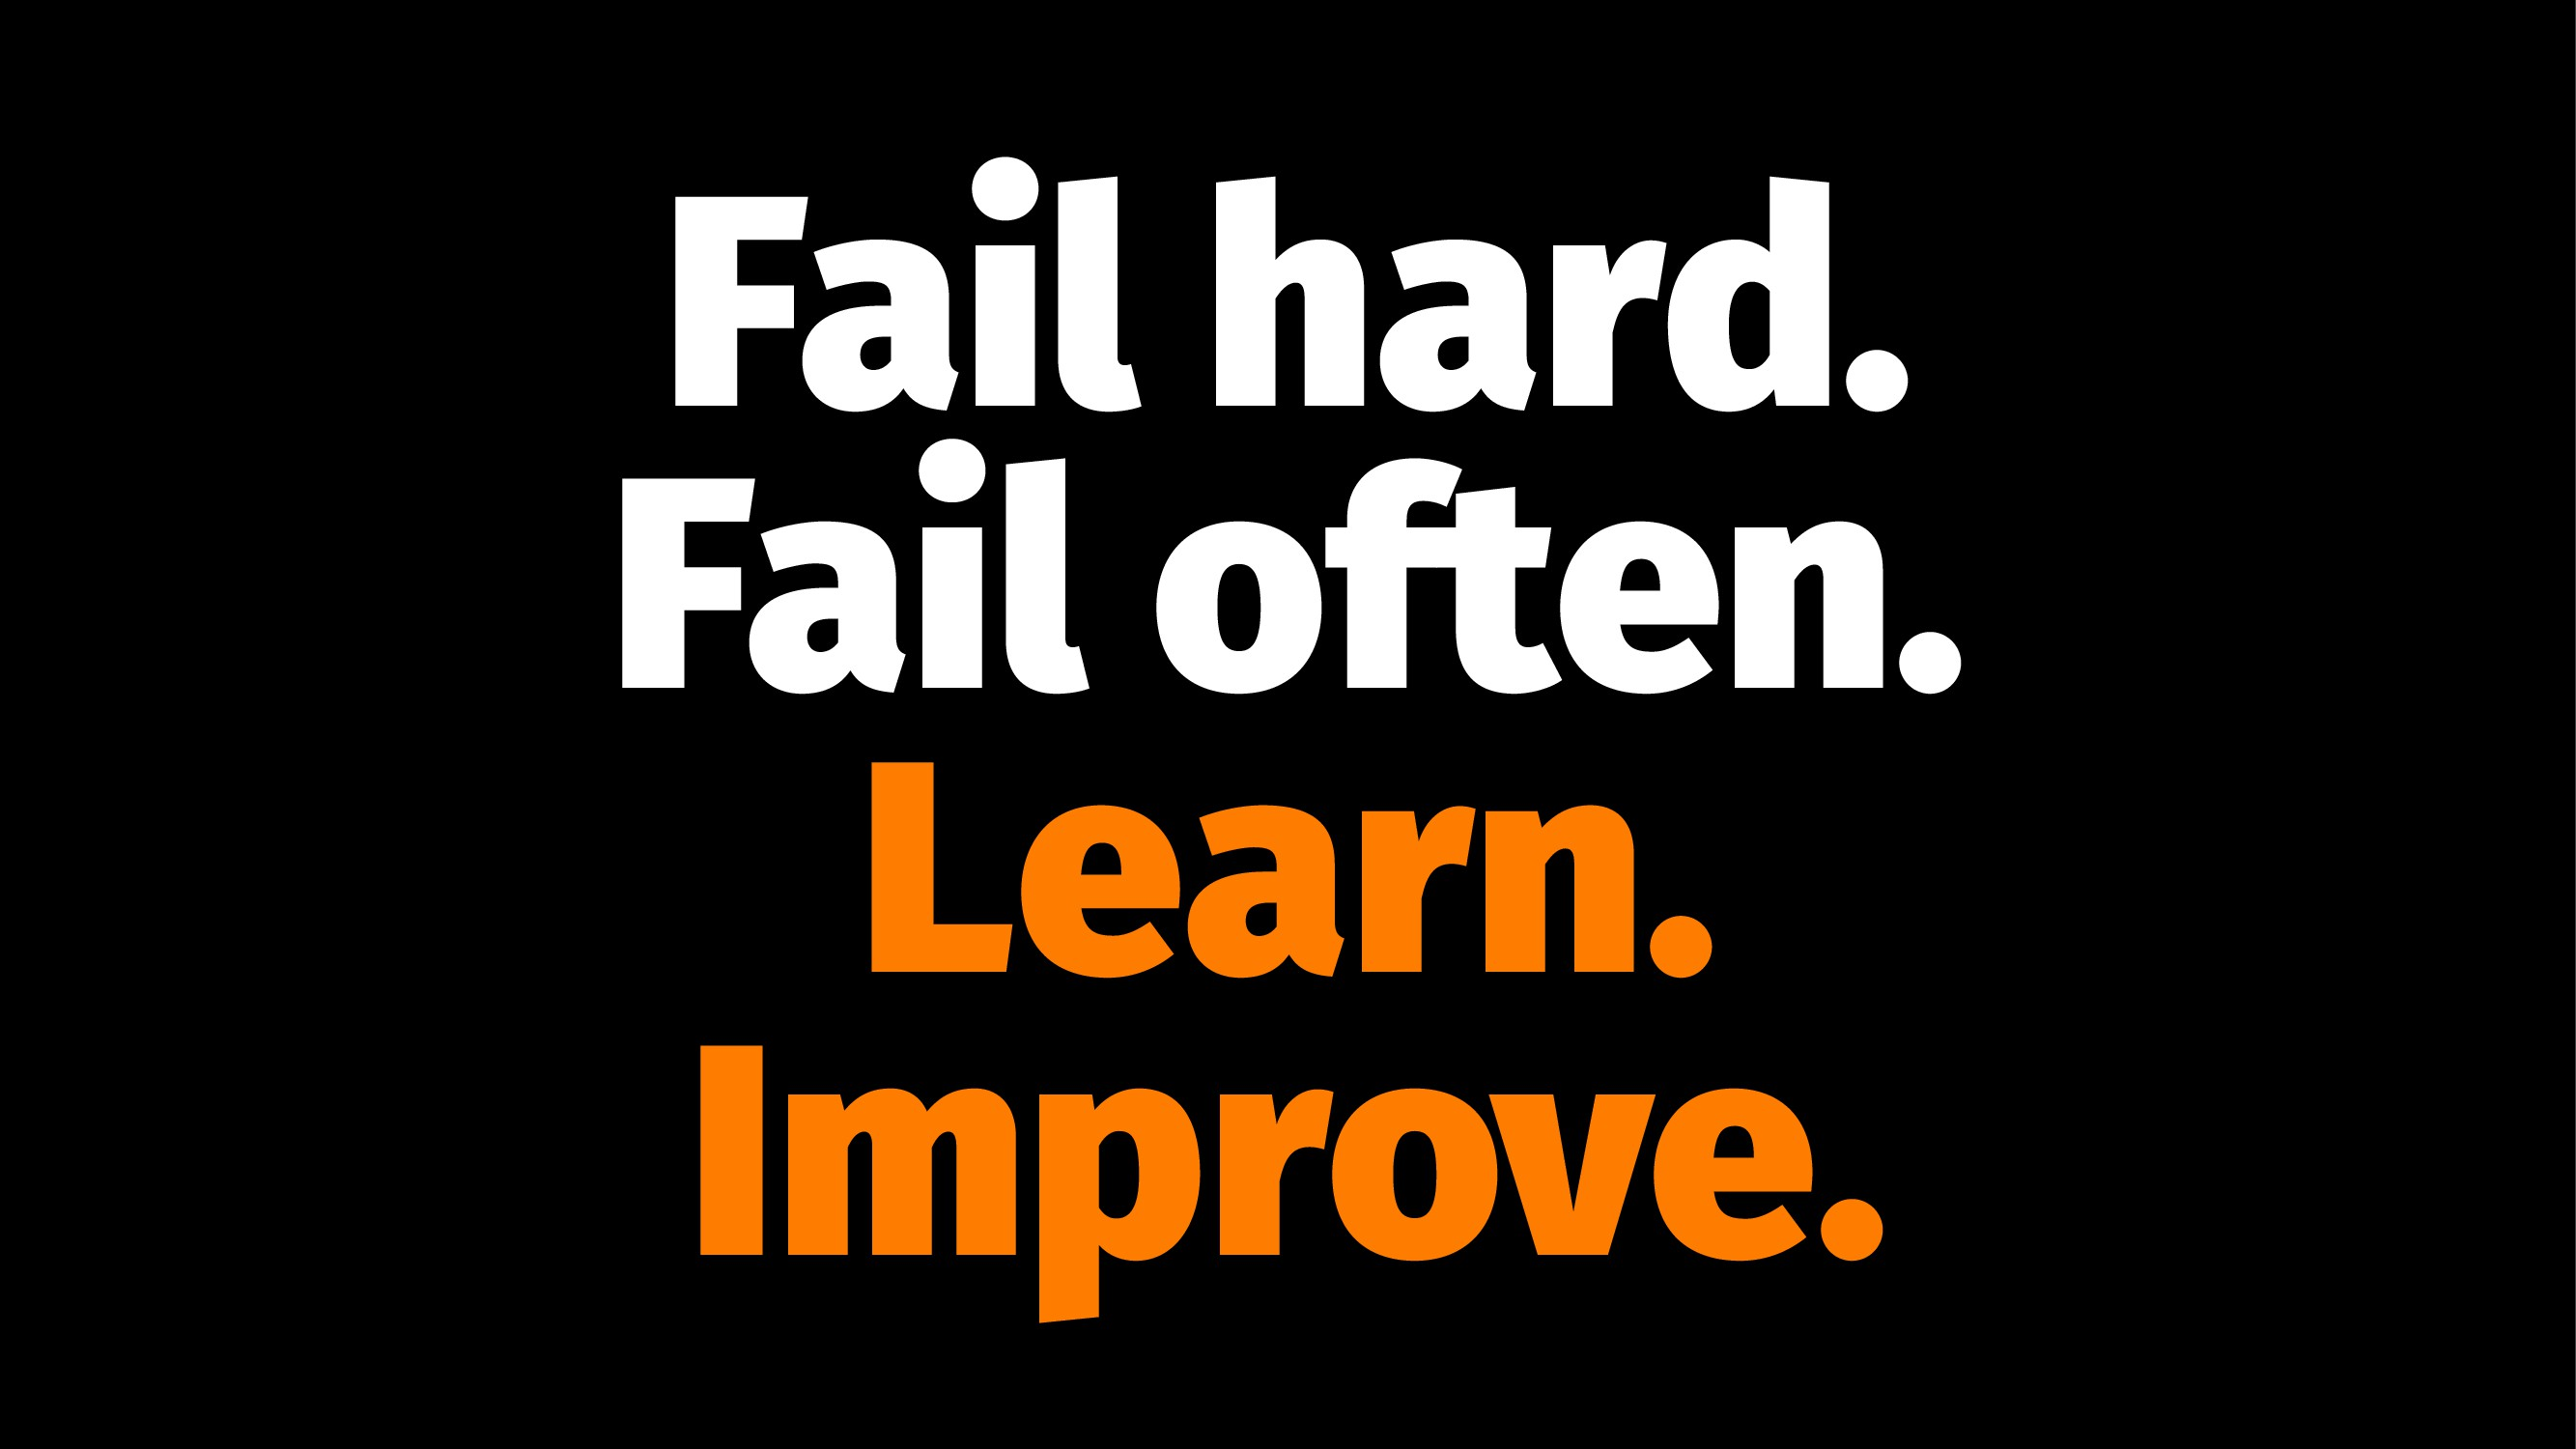 Fail hard. Fail often. Learn. Improve.